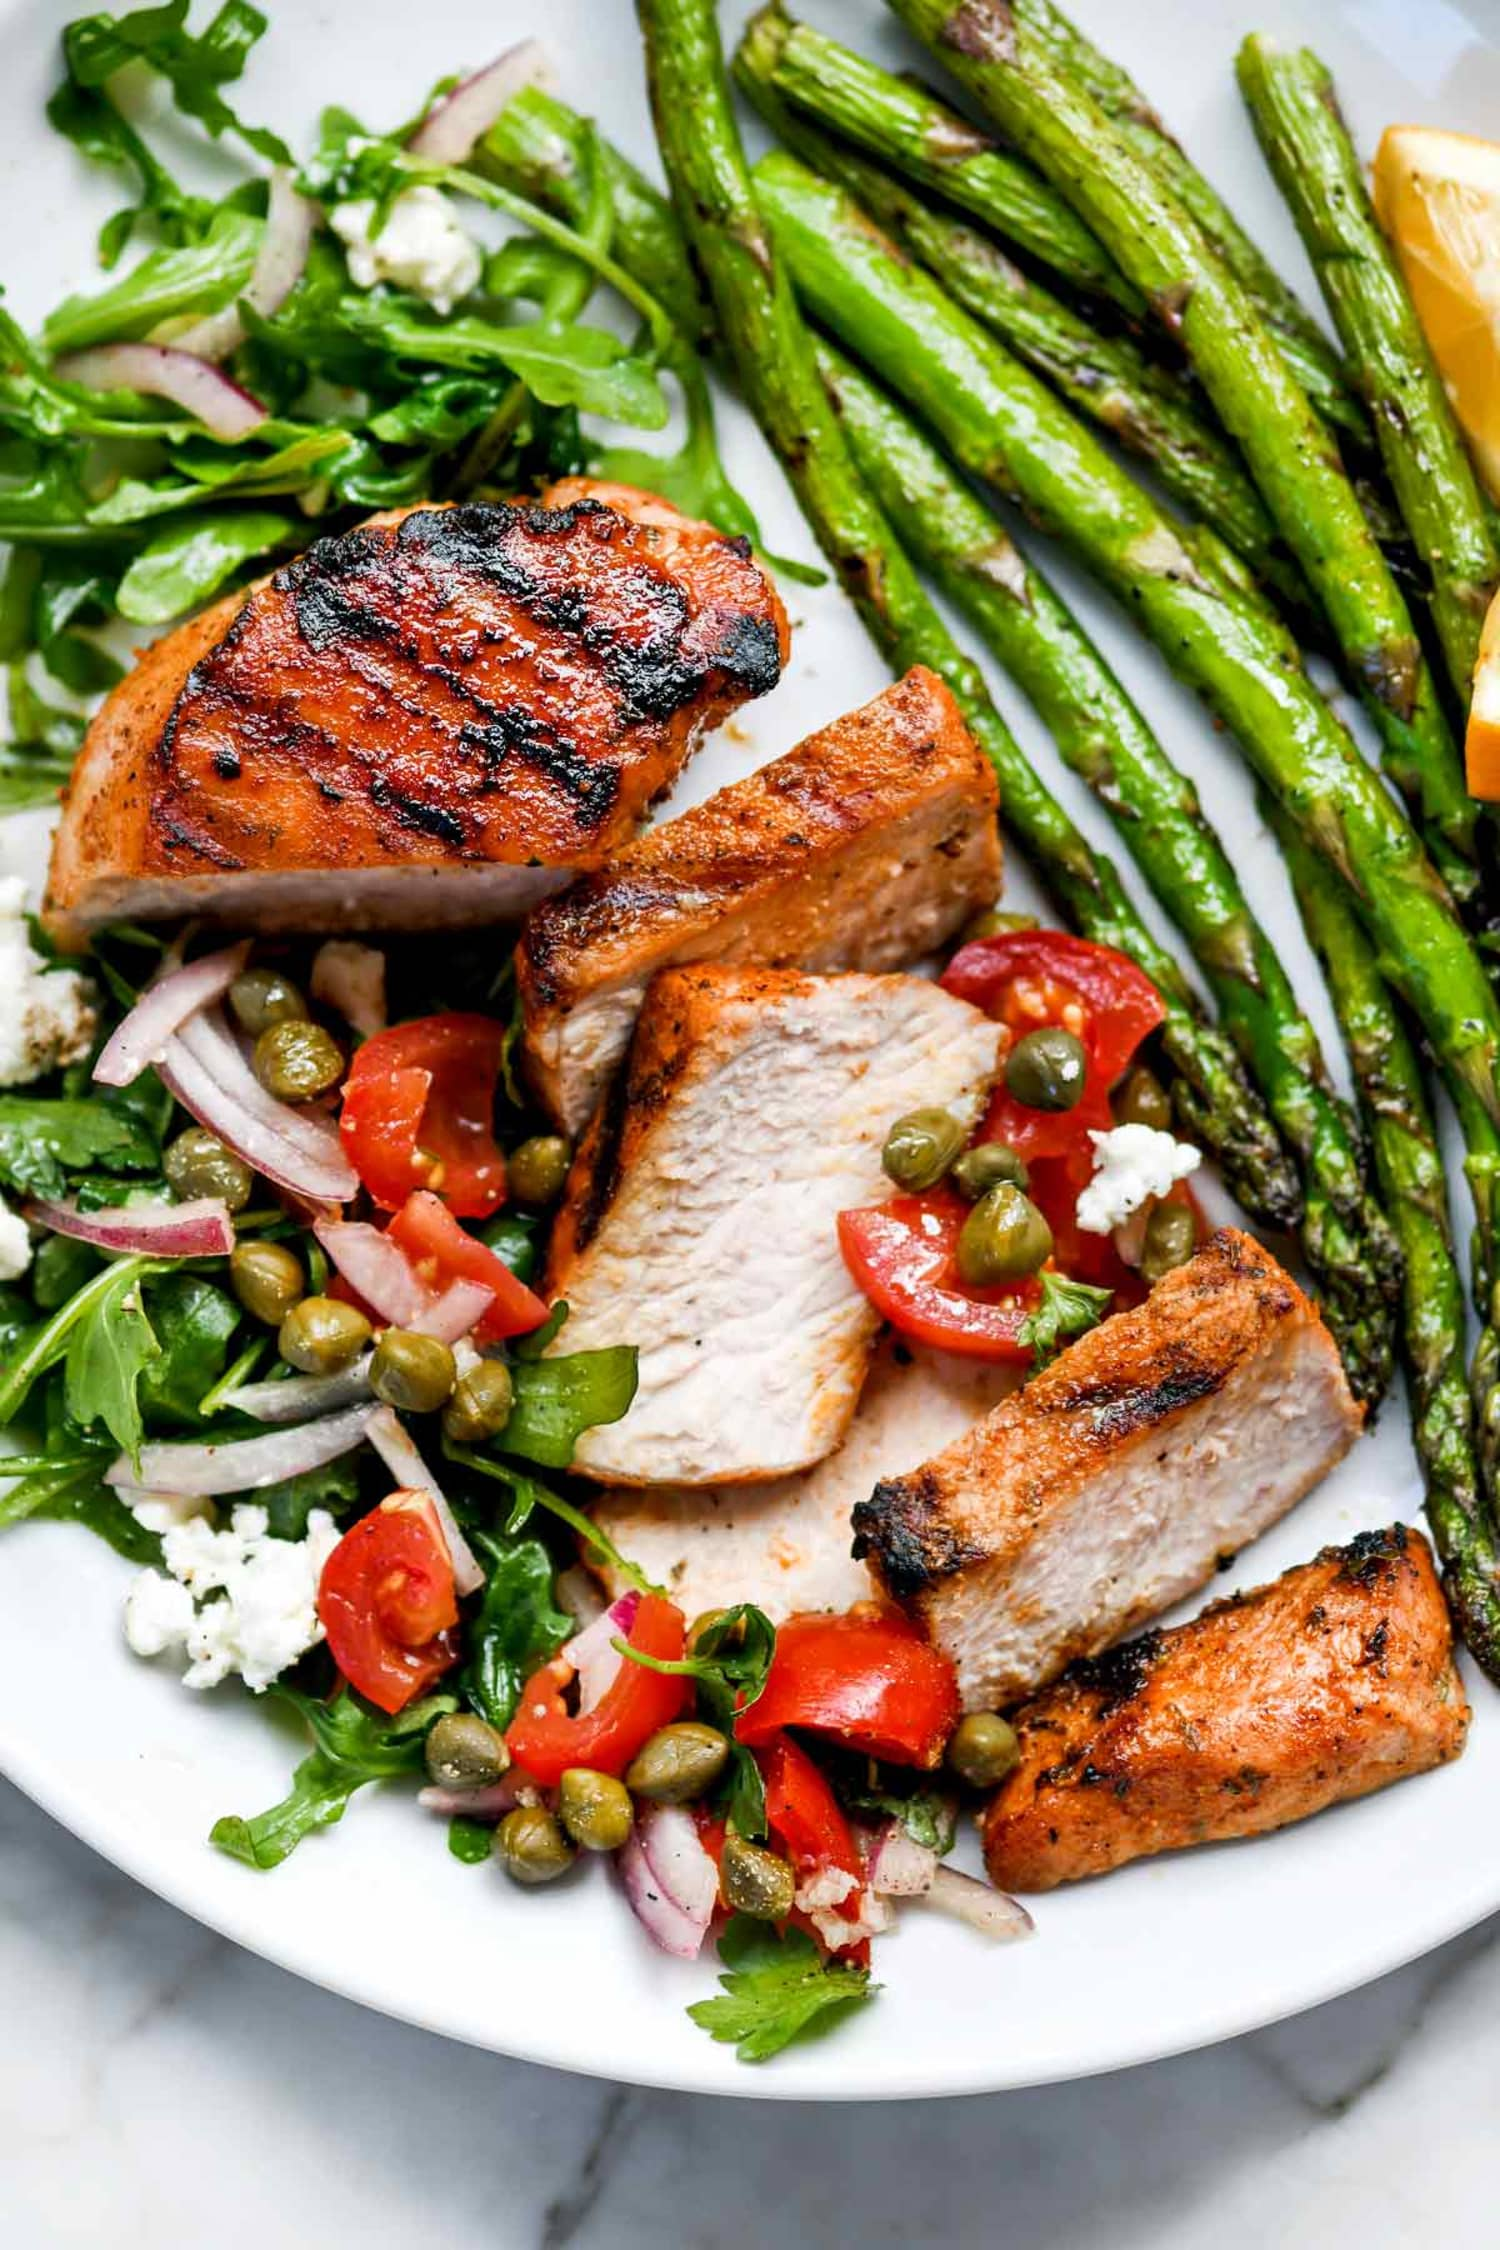 Mediterranean Grilled Pork Chops Are a Summer Treat